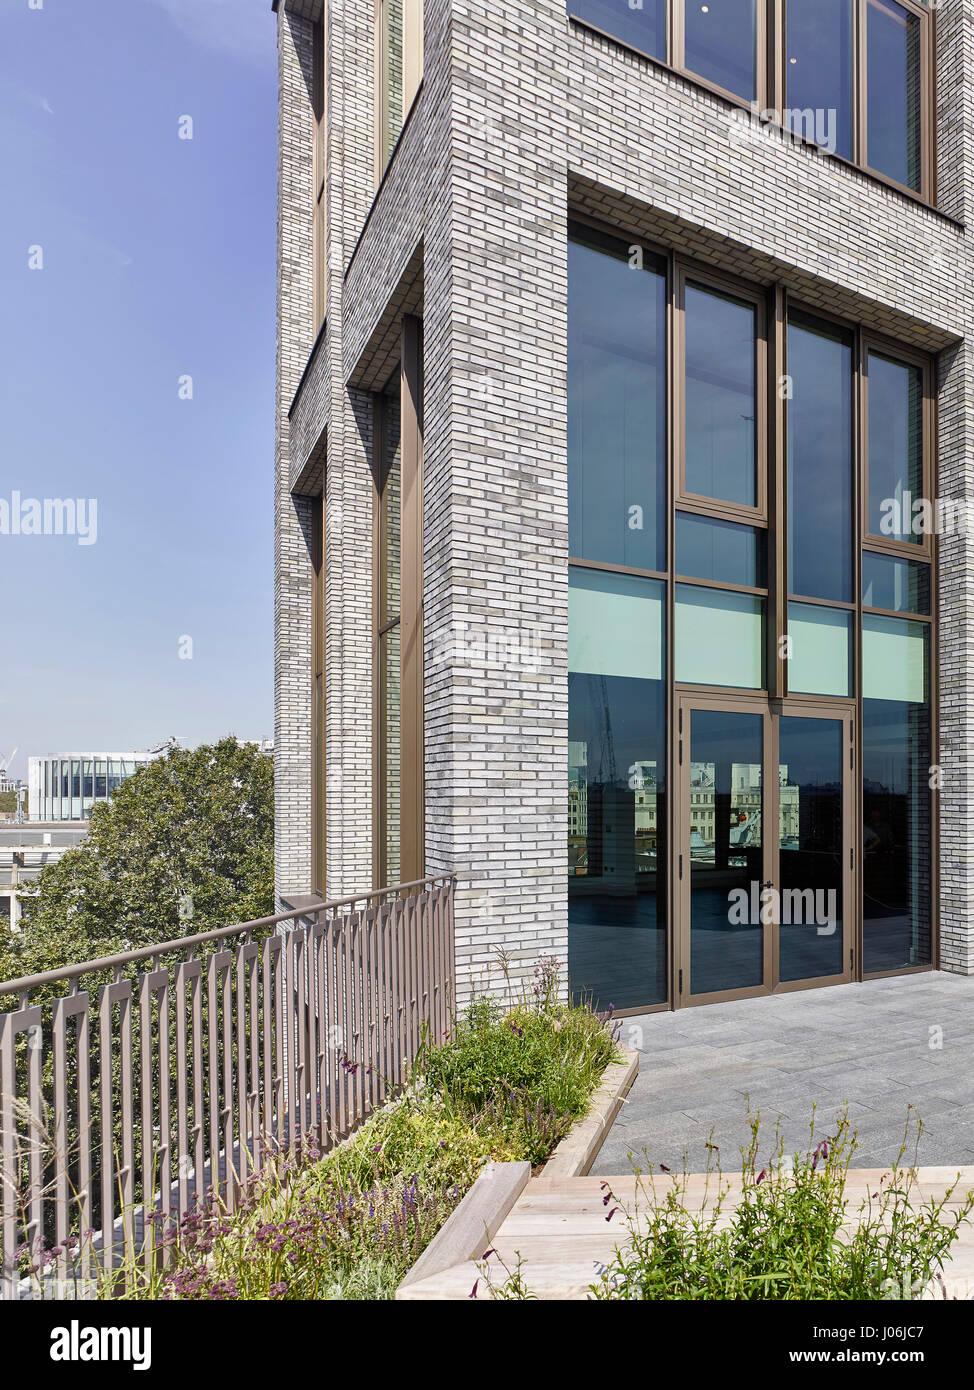 Corner. 55 Victoria Street, London, United Kingdom. Architect: Stiff + Trevillion Architects, 2016. - Stock Image